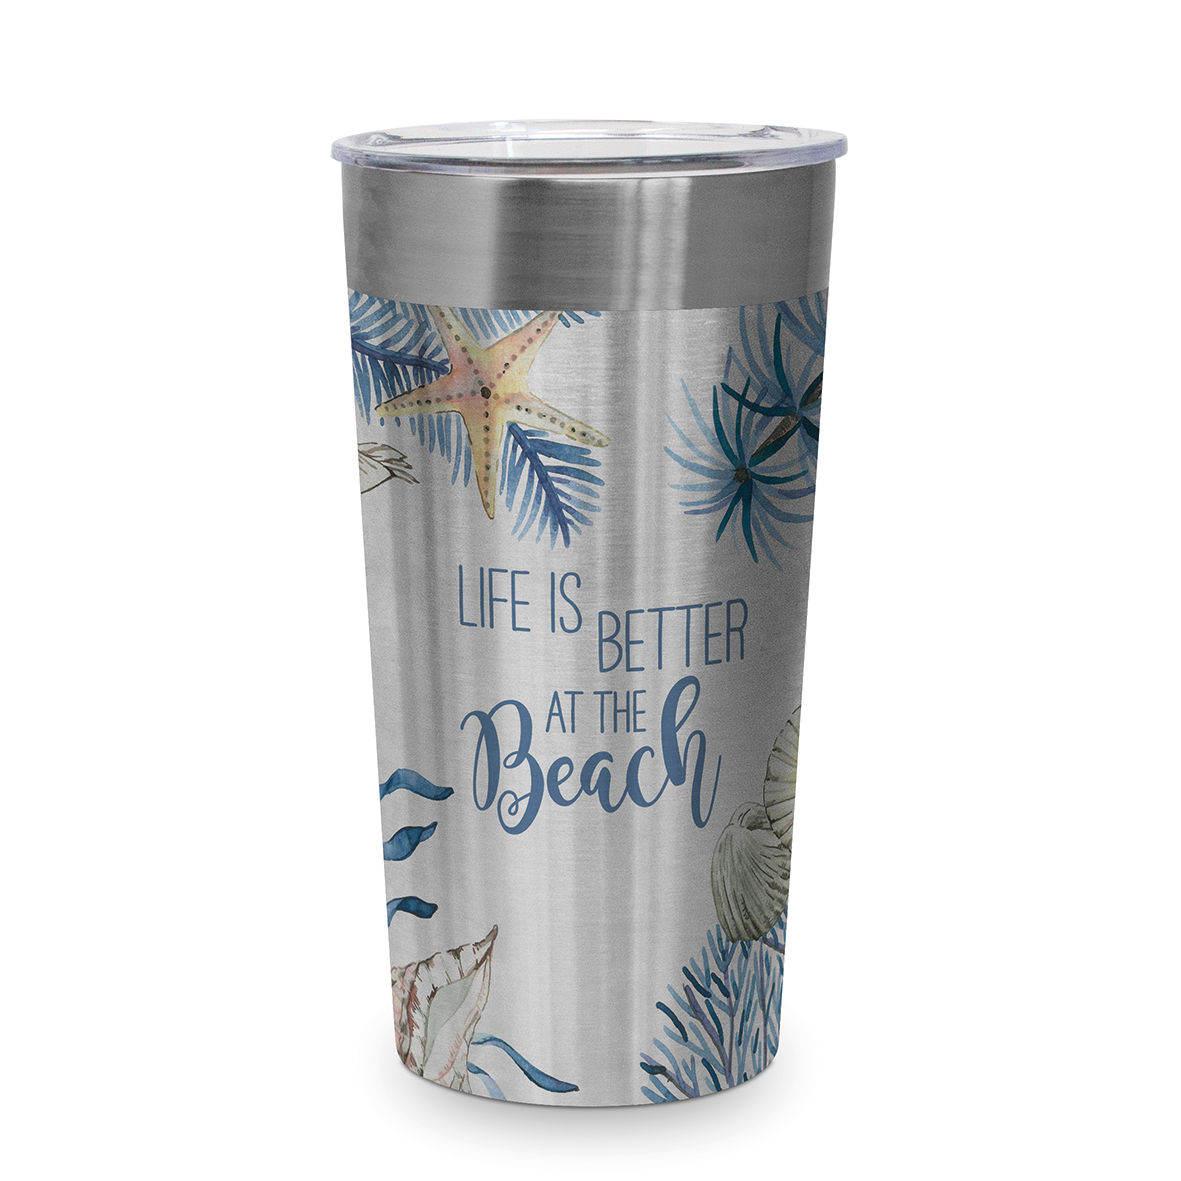 Ocean Life is better Steel Travel Mug